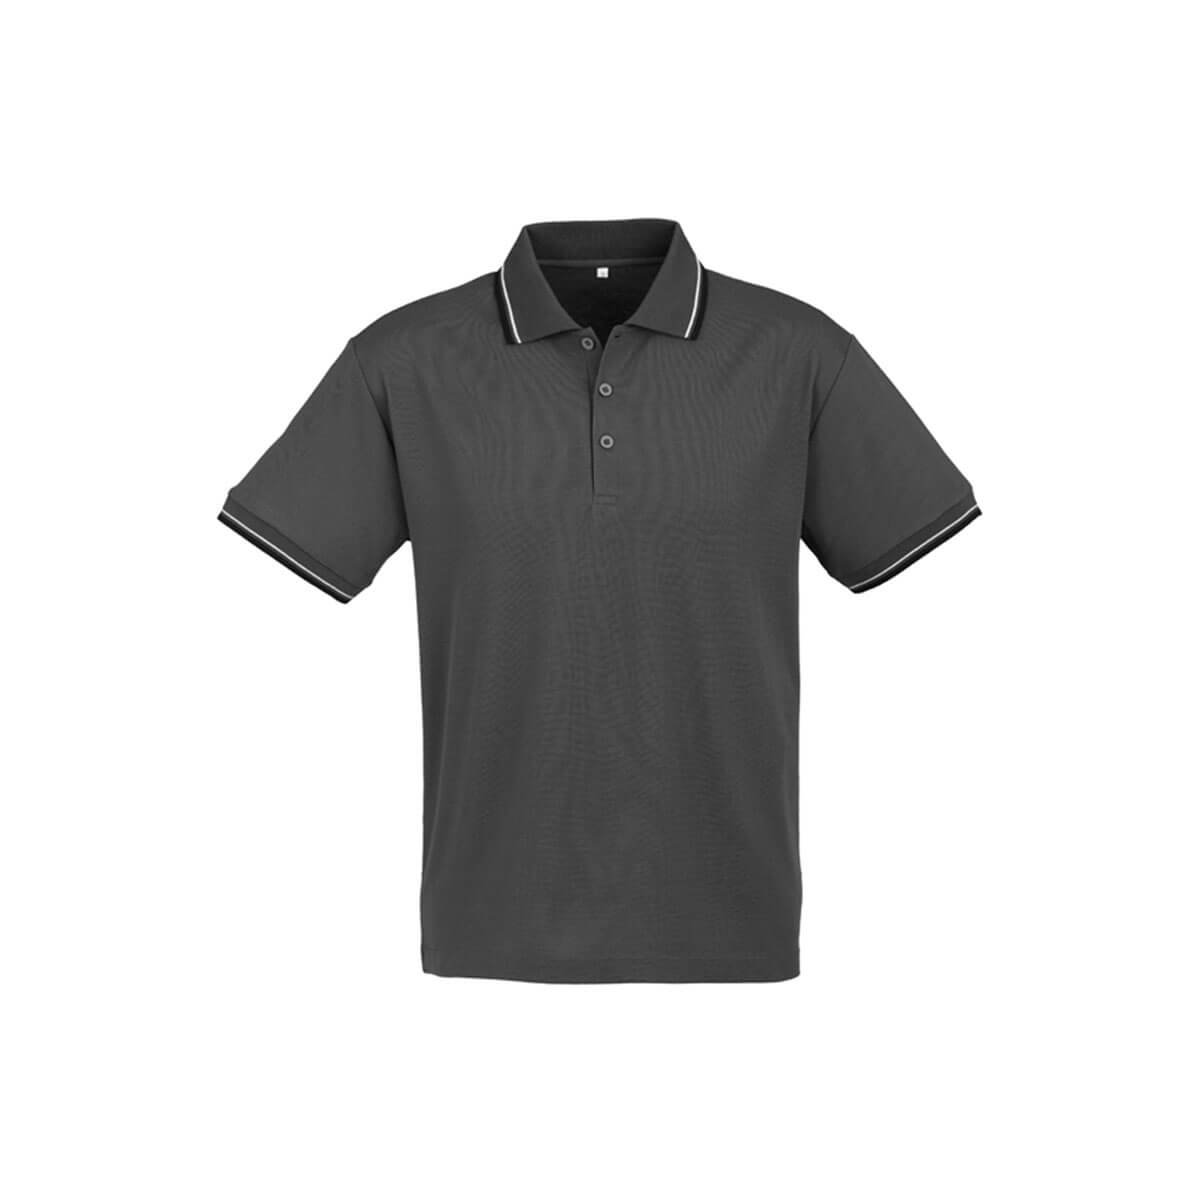 Mens Cambridge Polo-Steel Grey / Black / White